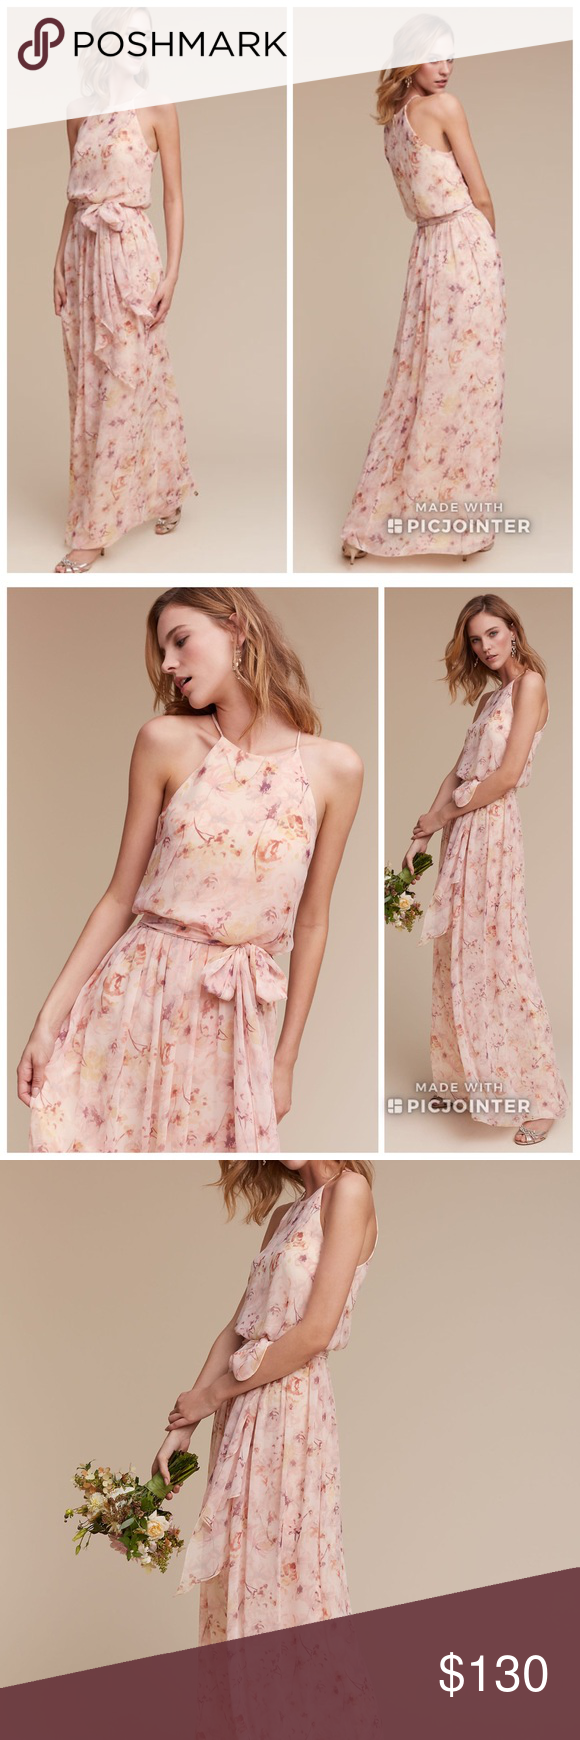 67908c9d77ee BHLDN Alana Blush Wildflower 6 Maxi Dress New. Size 6. Blush Wildflower  color.